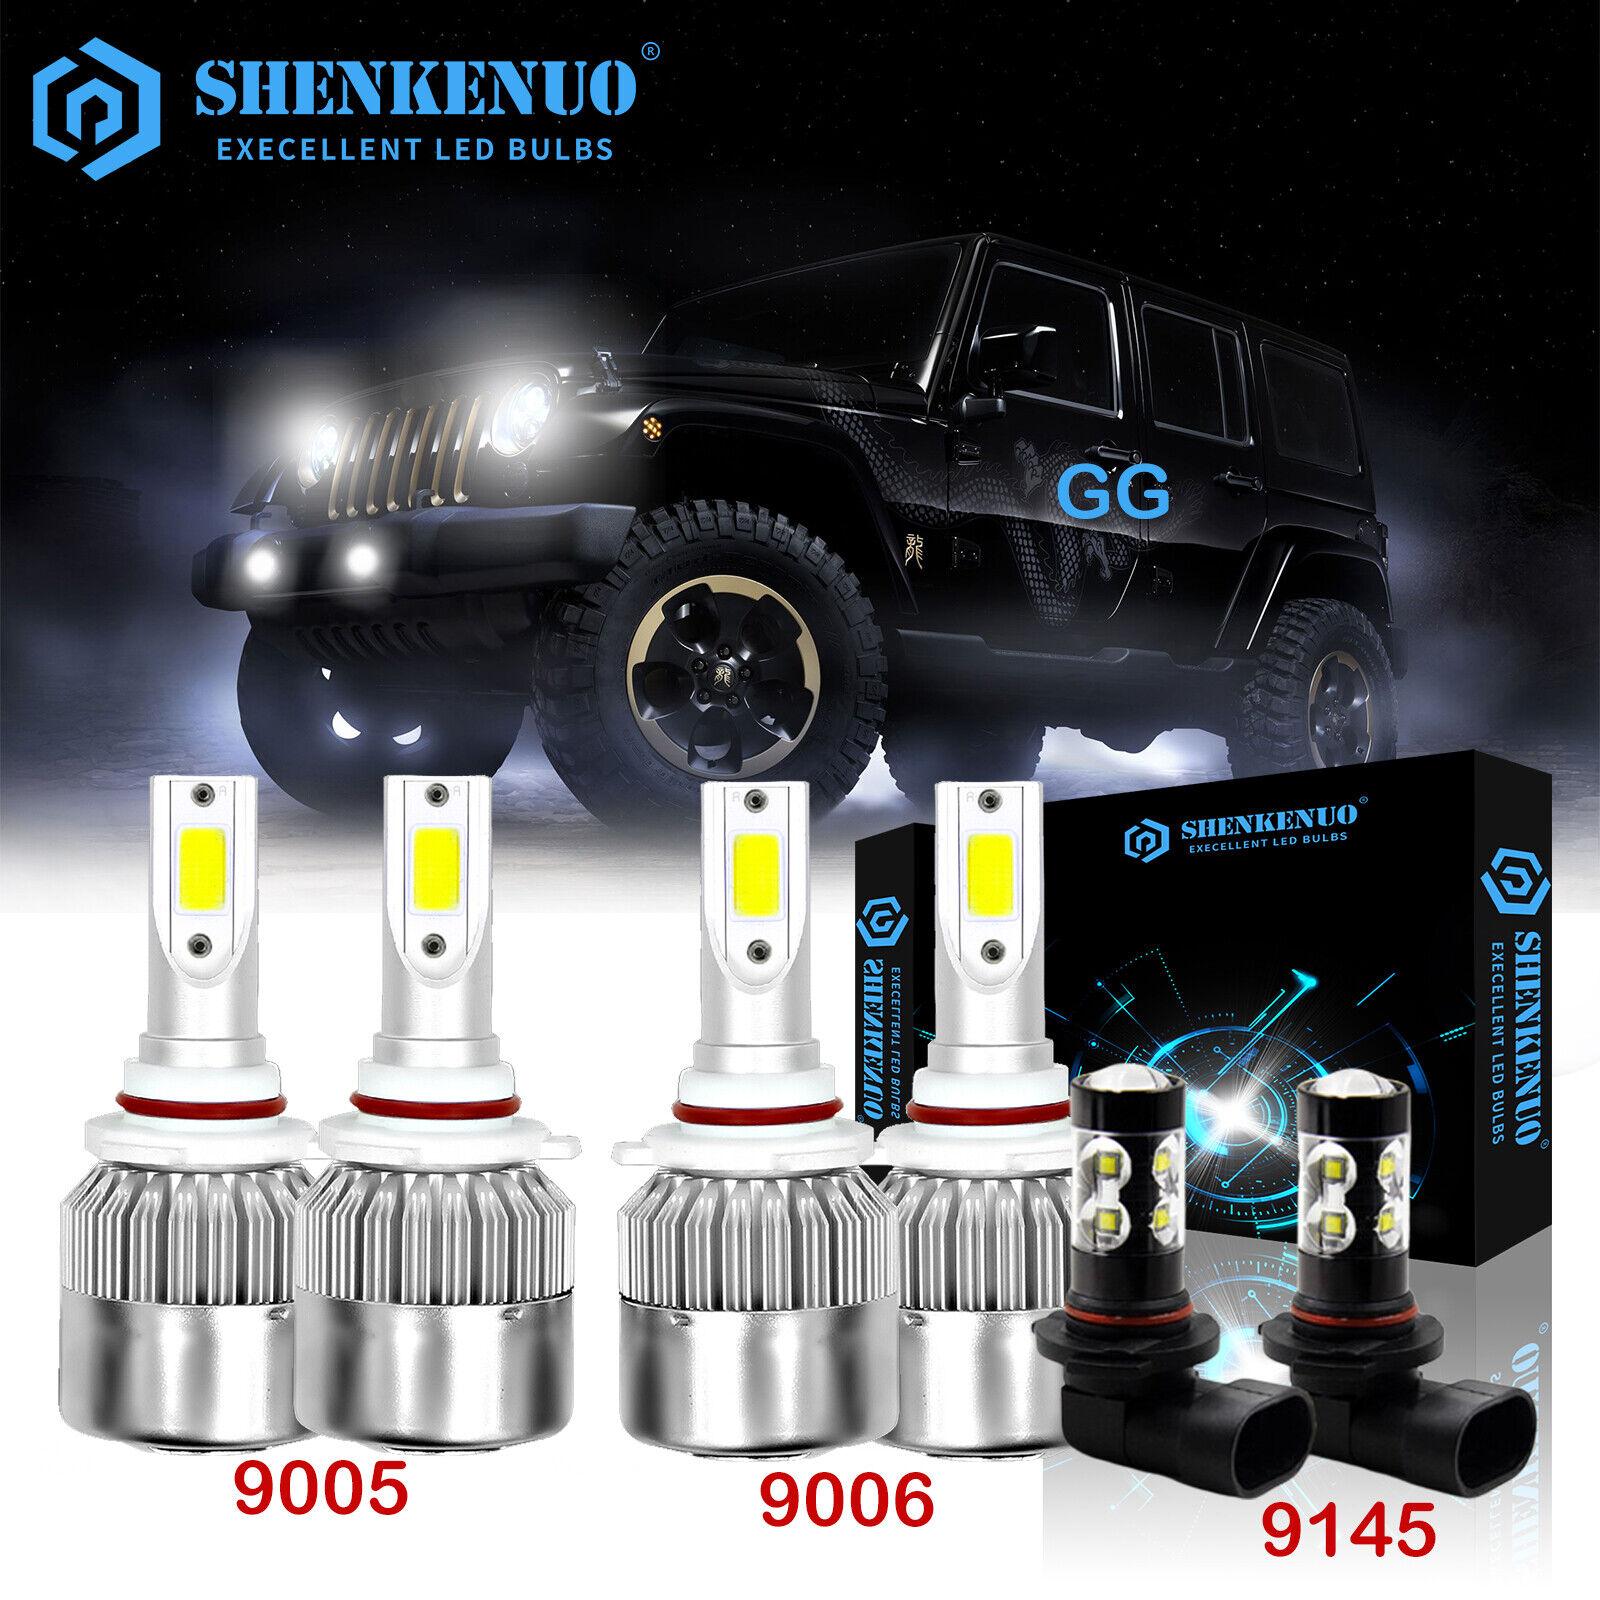 SHENKENUO 9005 9006 9145 Combo LED Headlight Bulbs For Jeep Grand Cherokee